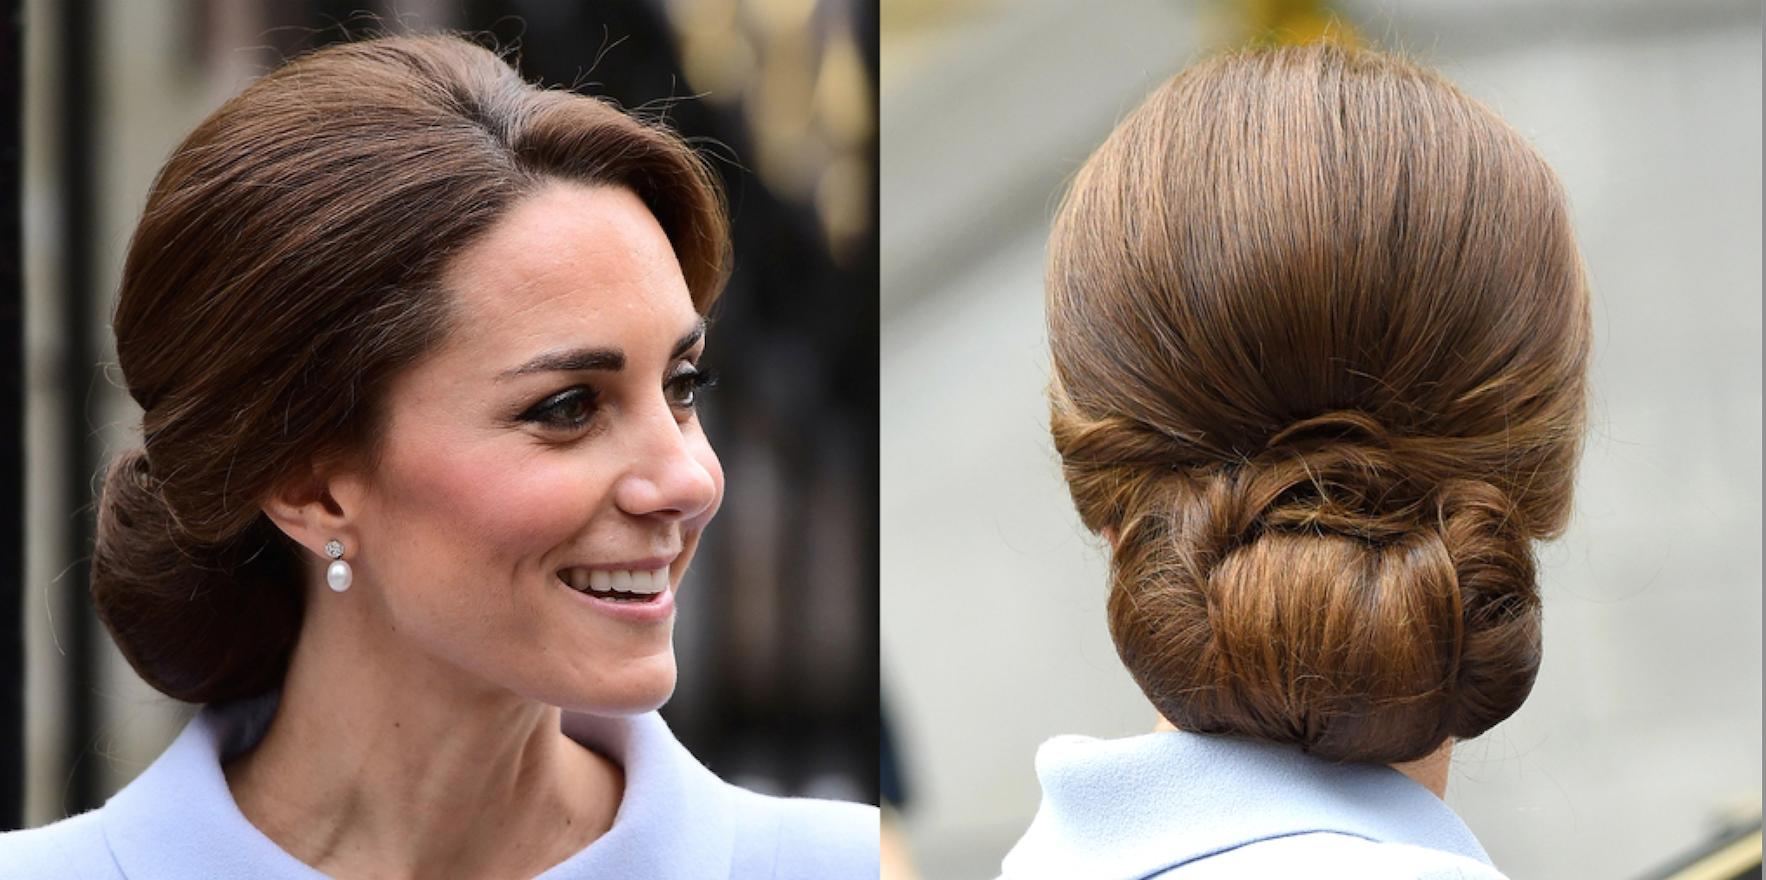 Kate Middleton Hairnet - Kate Middleton Hairnet How To